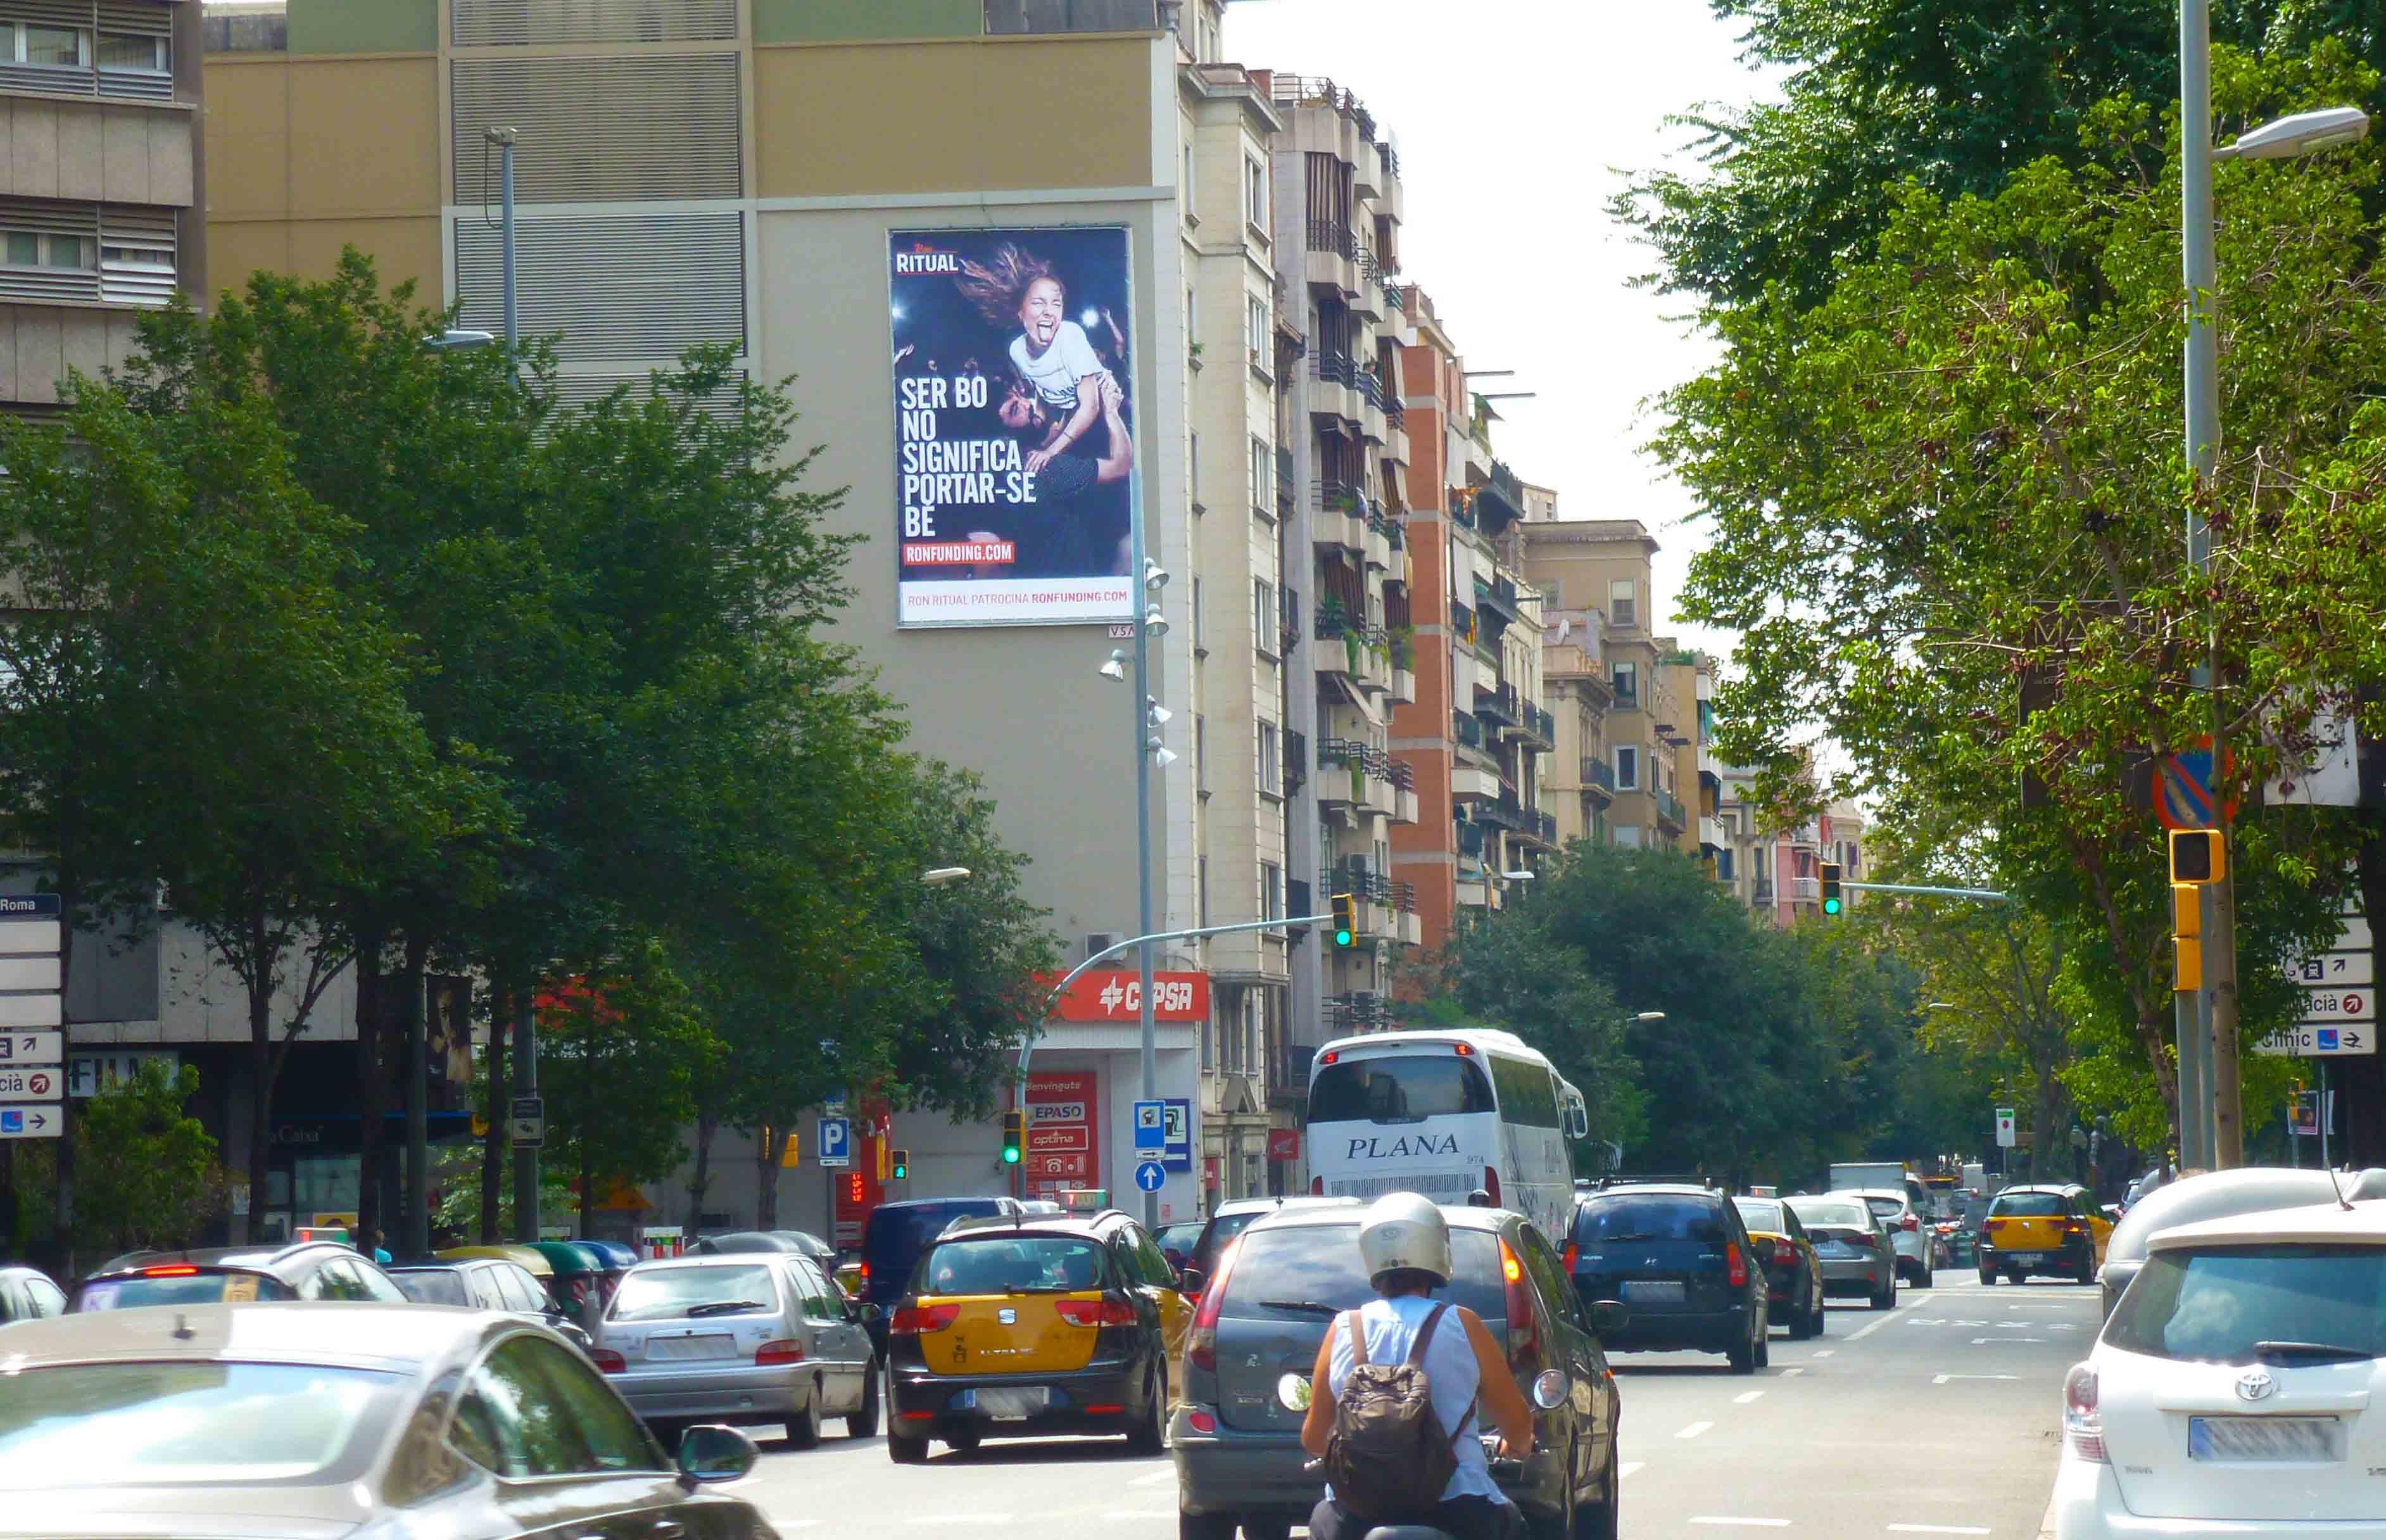 pym-medianera-publicidad-exterior-ron-ritual-barcelona-vsa-comunicacion